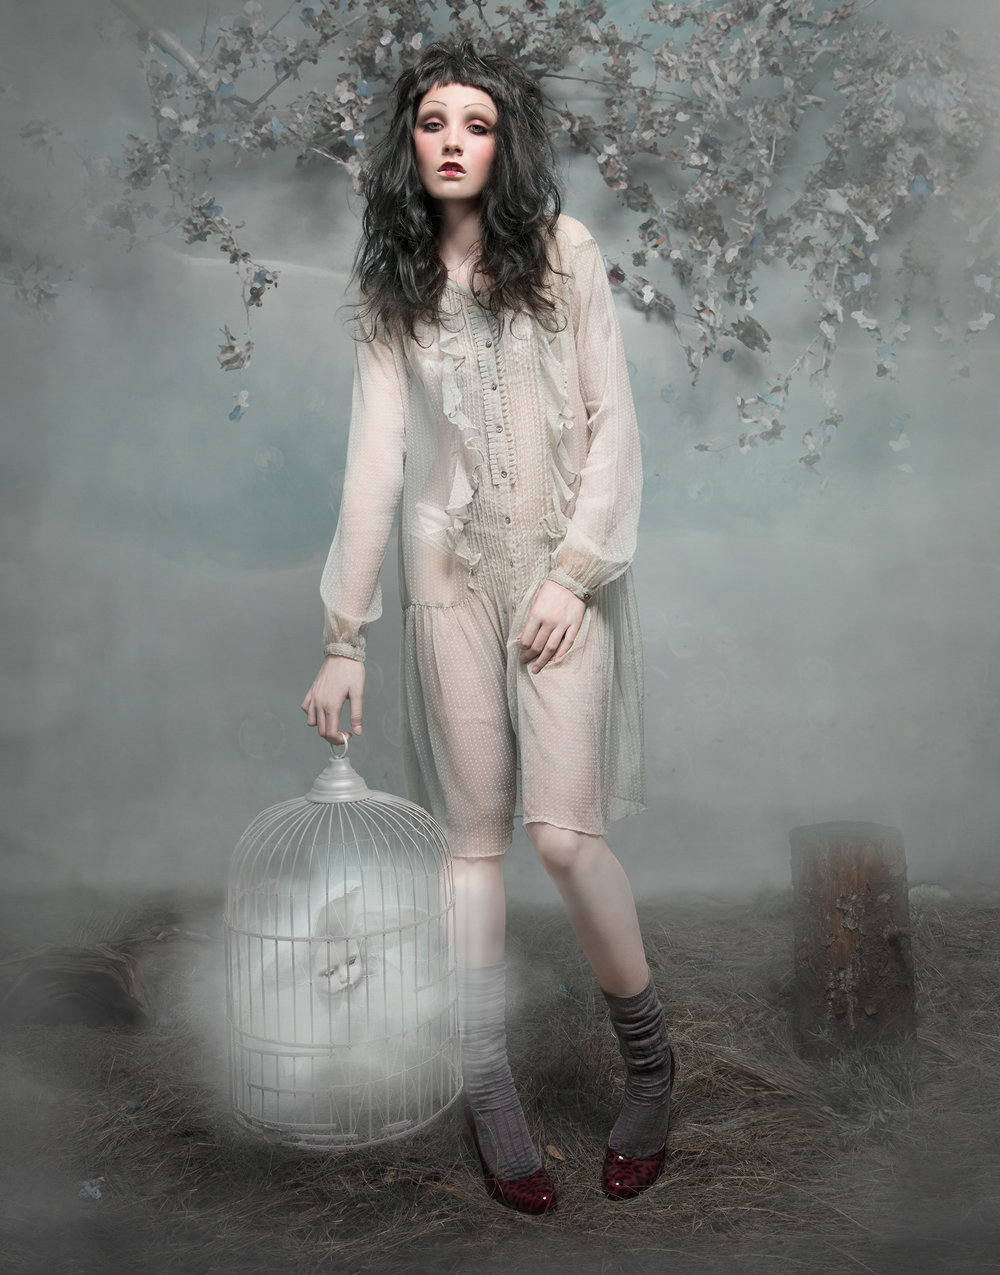 White forest Diana-1624-s.jpg